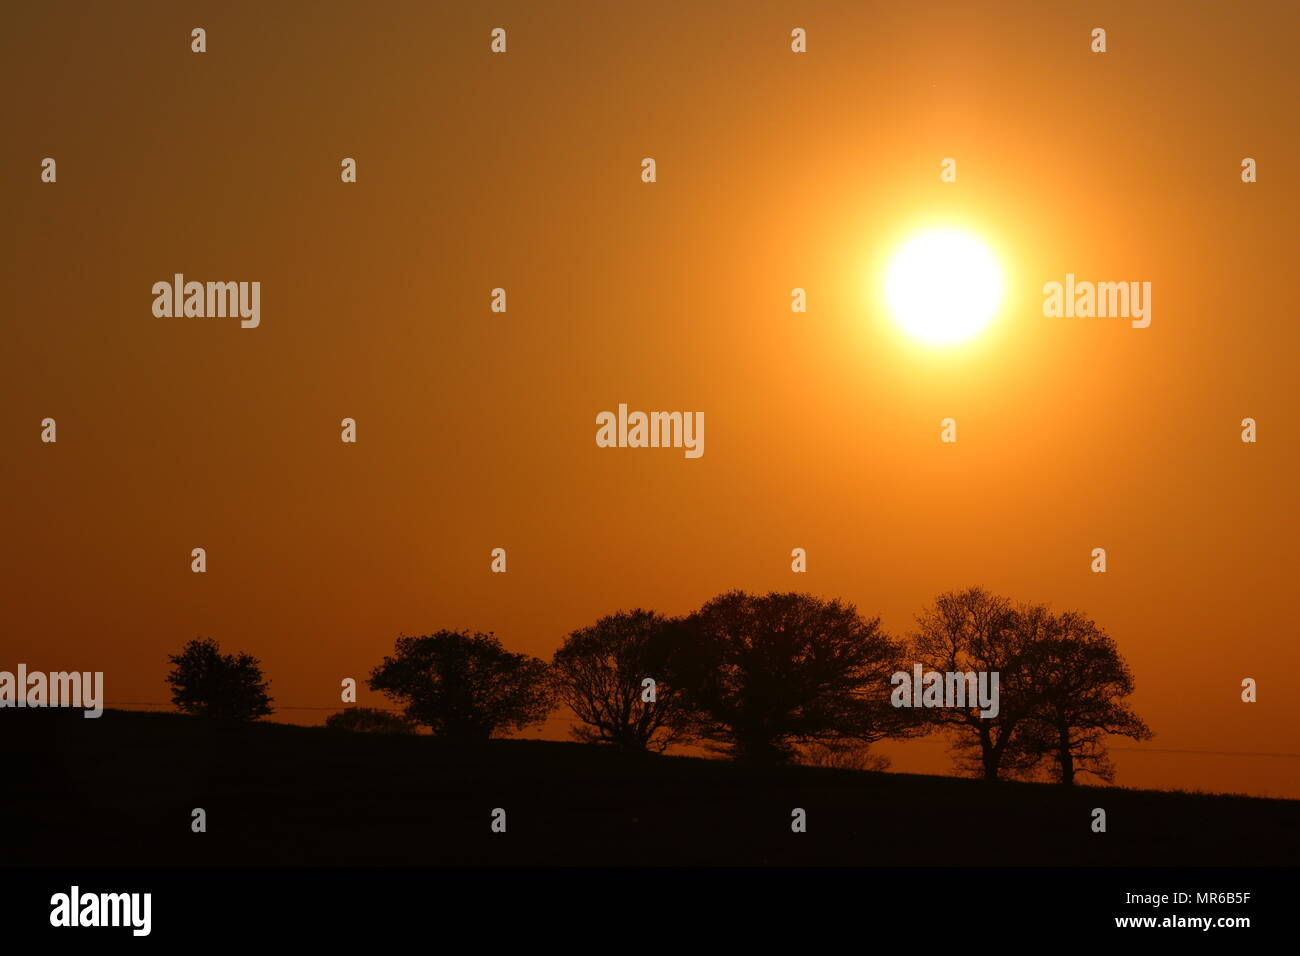 The sun setting behind trees in Swillington, Leeds. - Stock Image